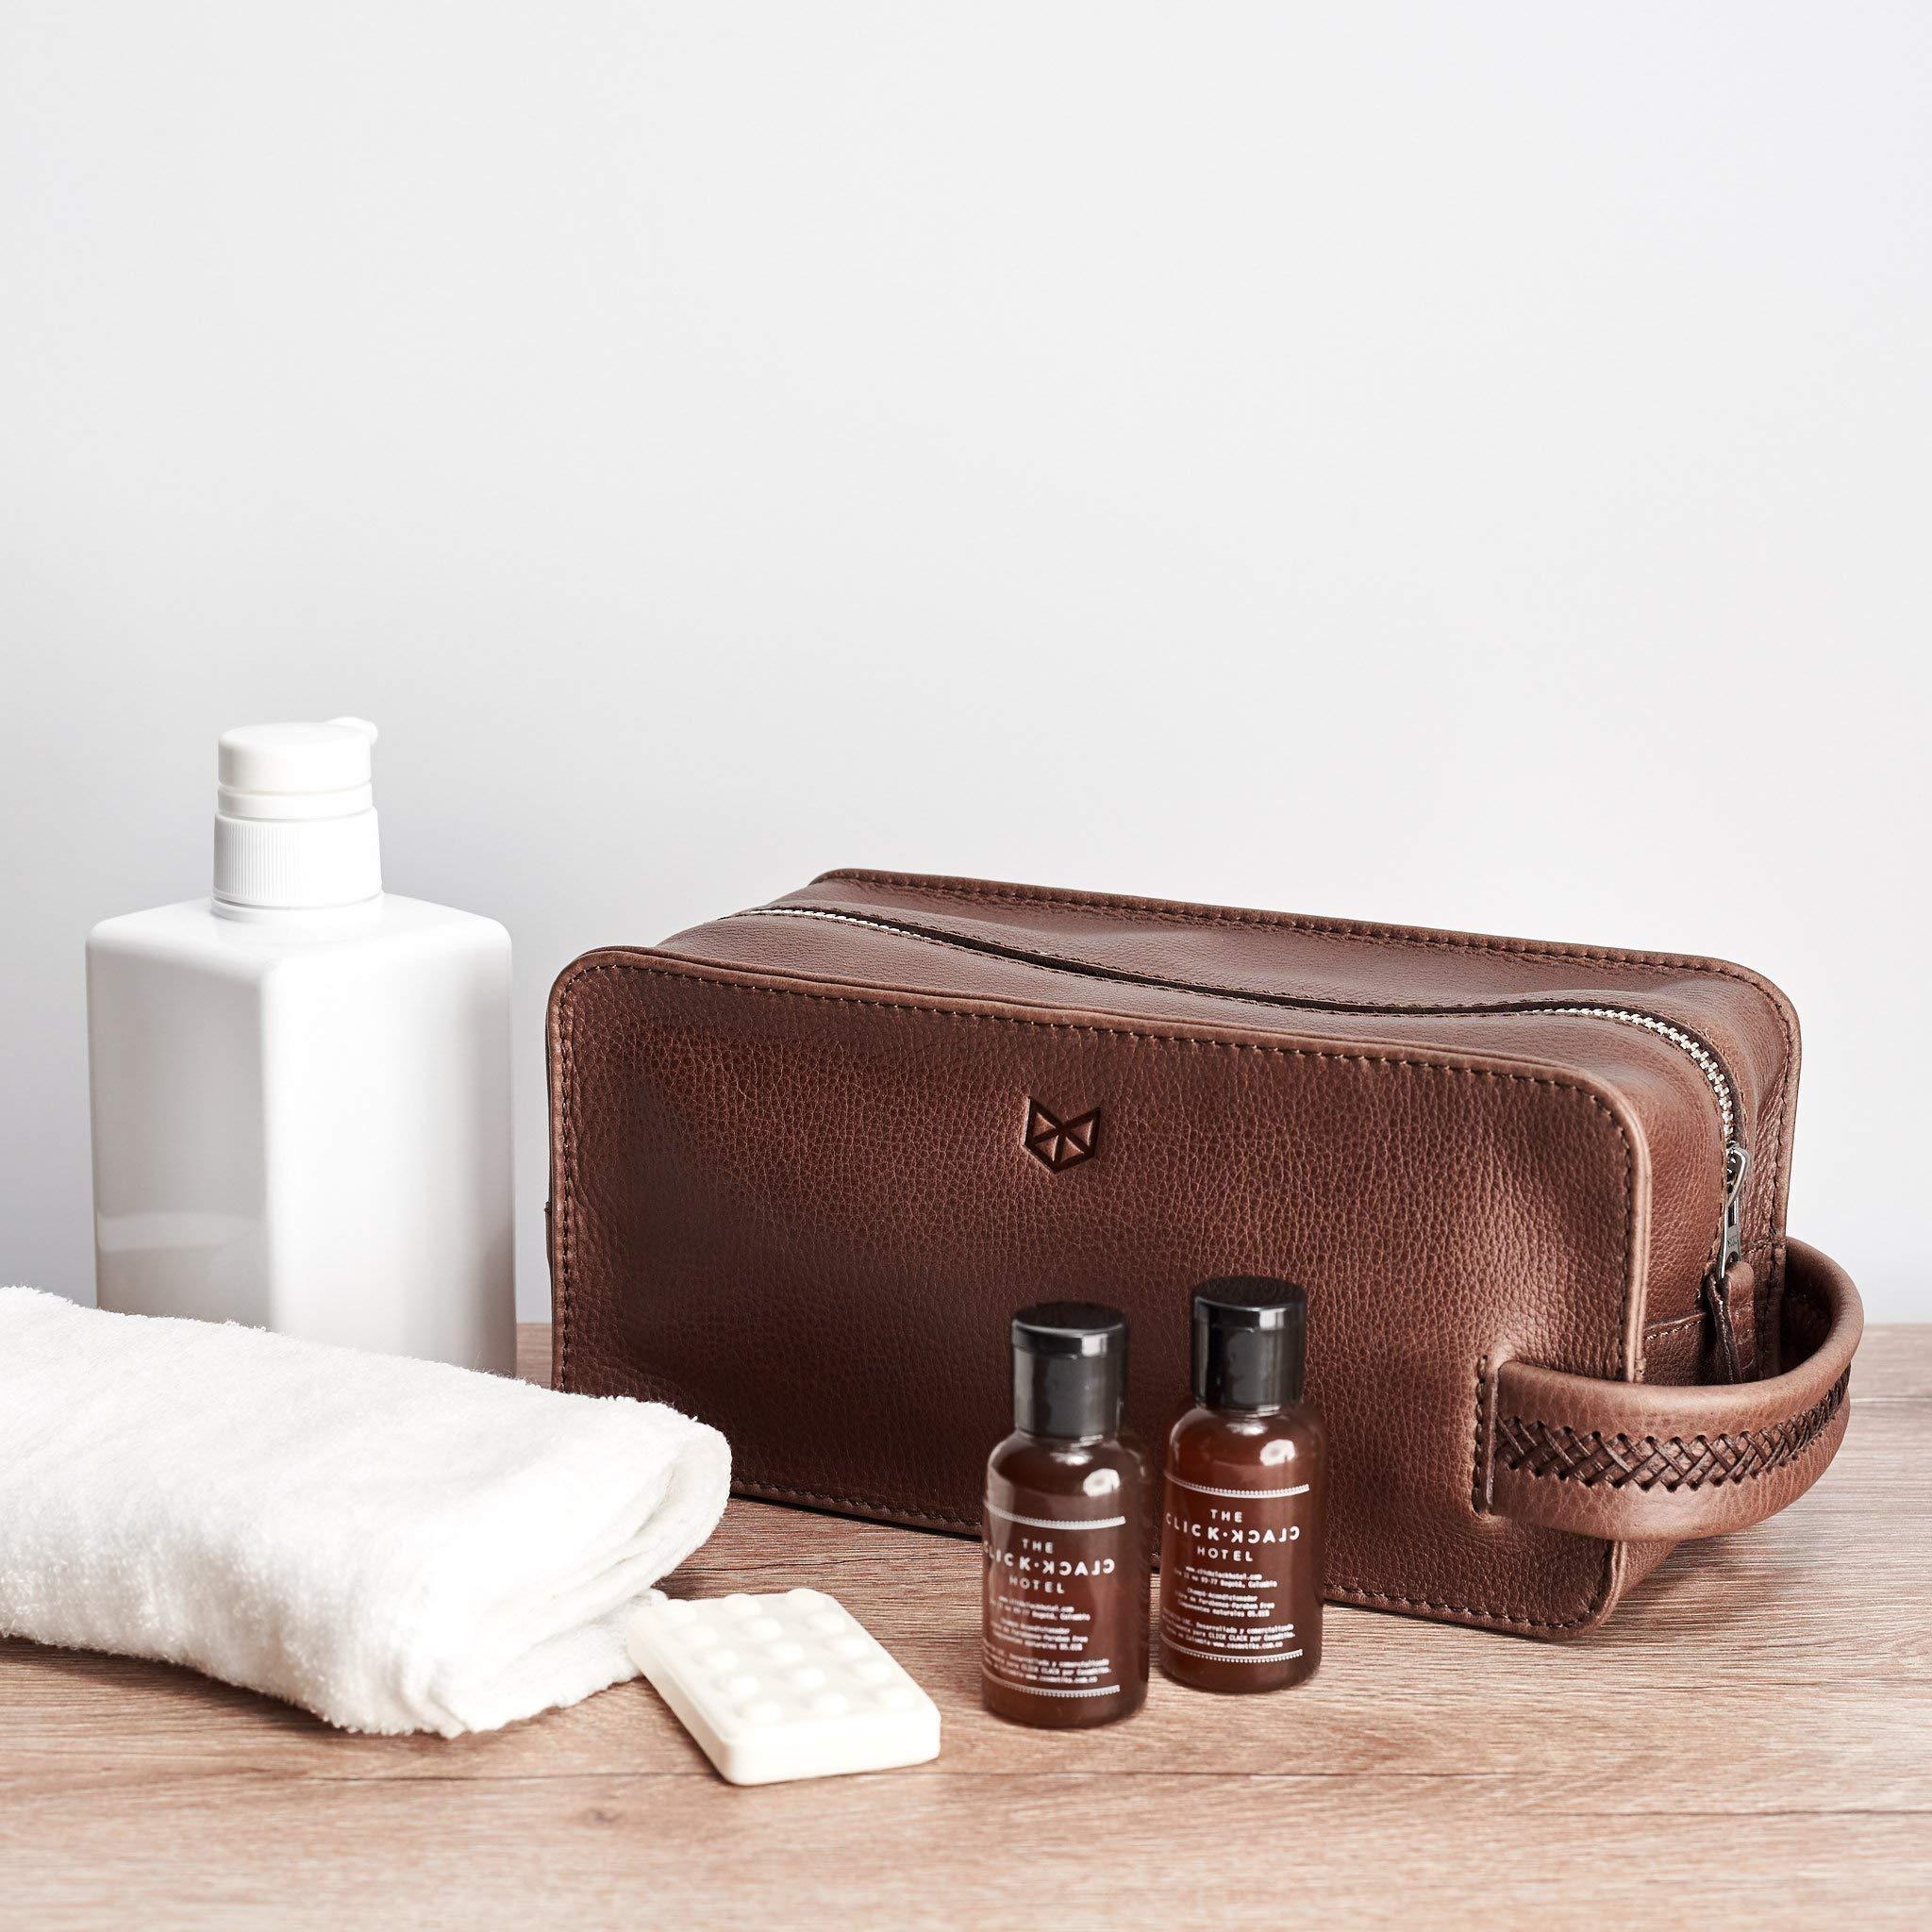 Capra Leather Toiletry Bag for Men, Brown Handmade Travel Dopp Kit, Wash Shaving Pouch, Waterproof Toiletries Storage. Groomsmen & Mens Gifts